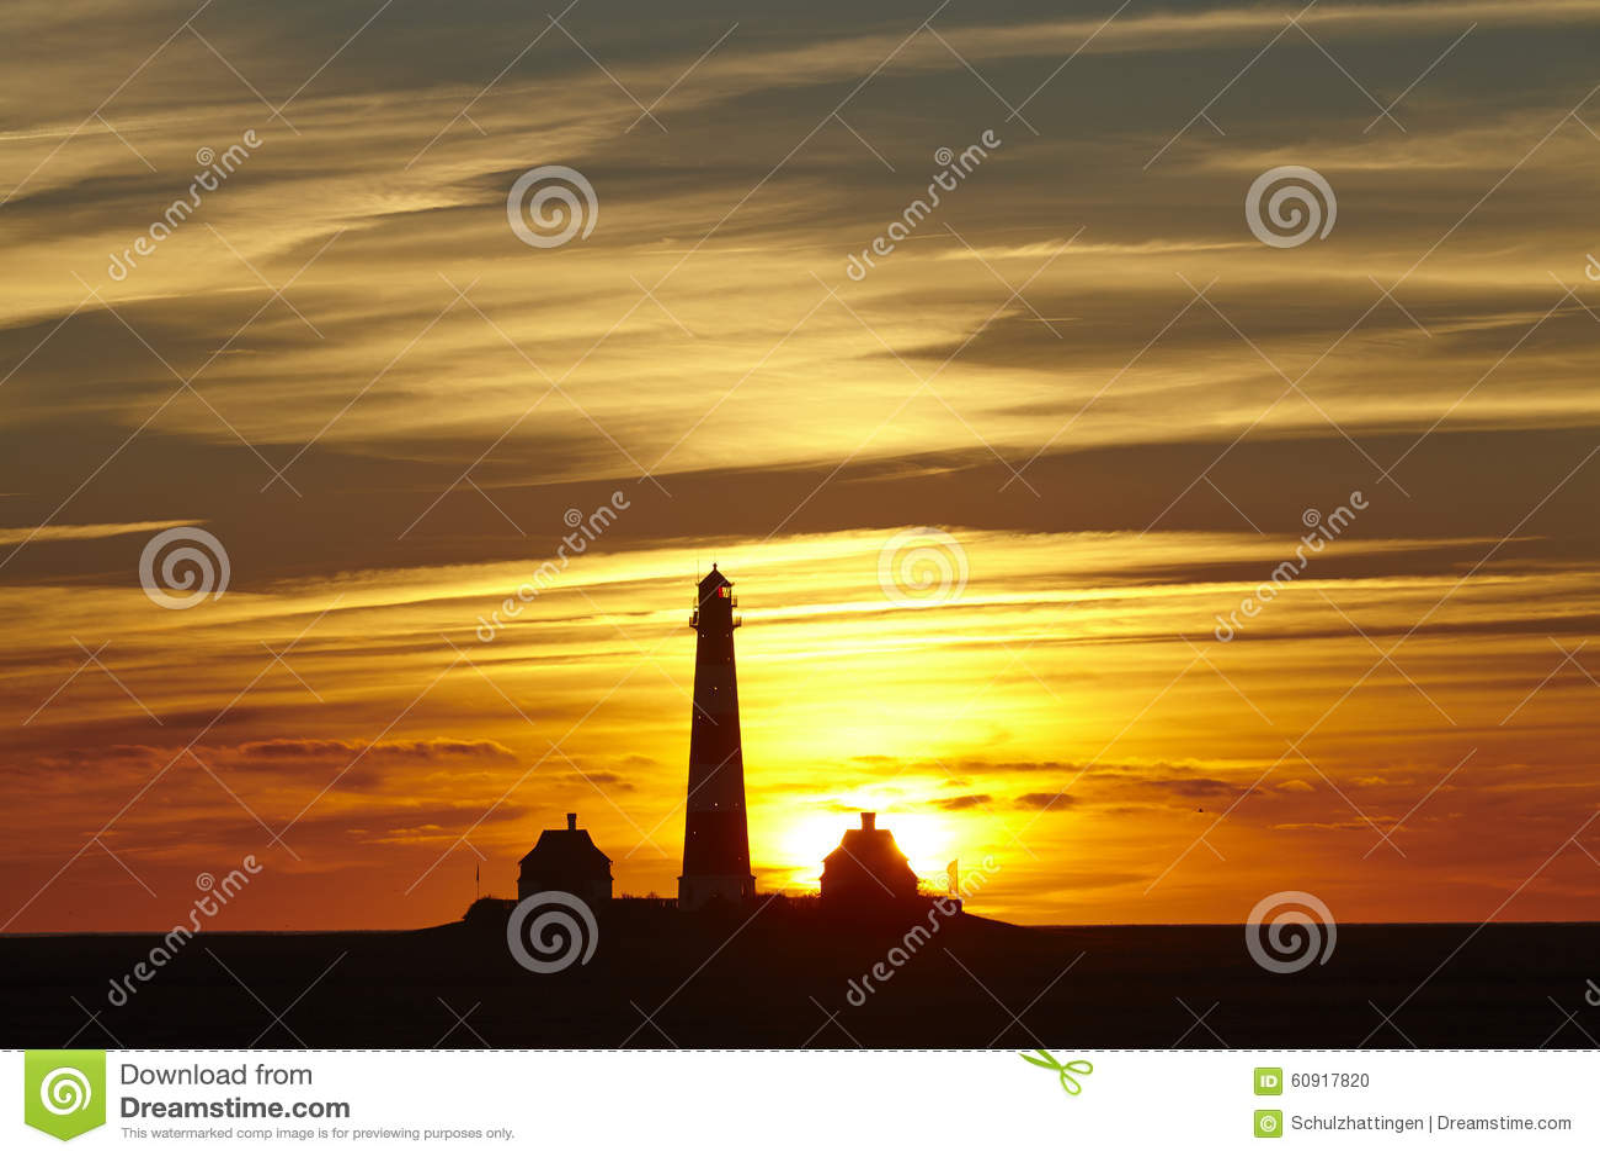 Westerhever (Γερμανία) - φάρος στο ηλιοβασίλεμα